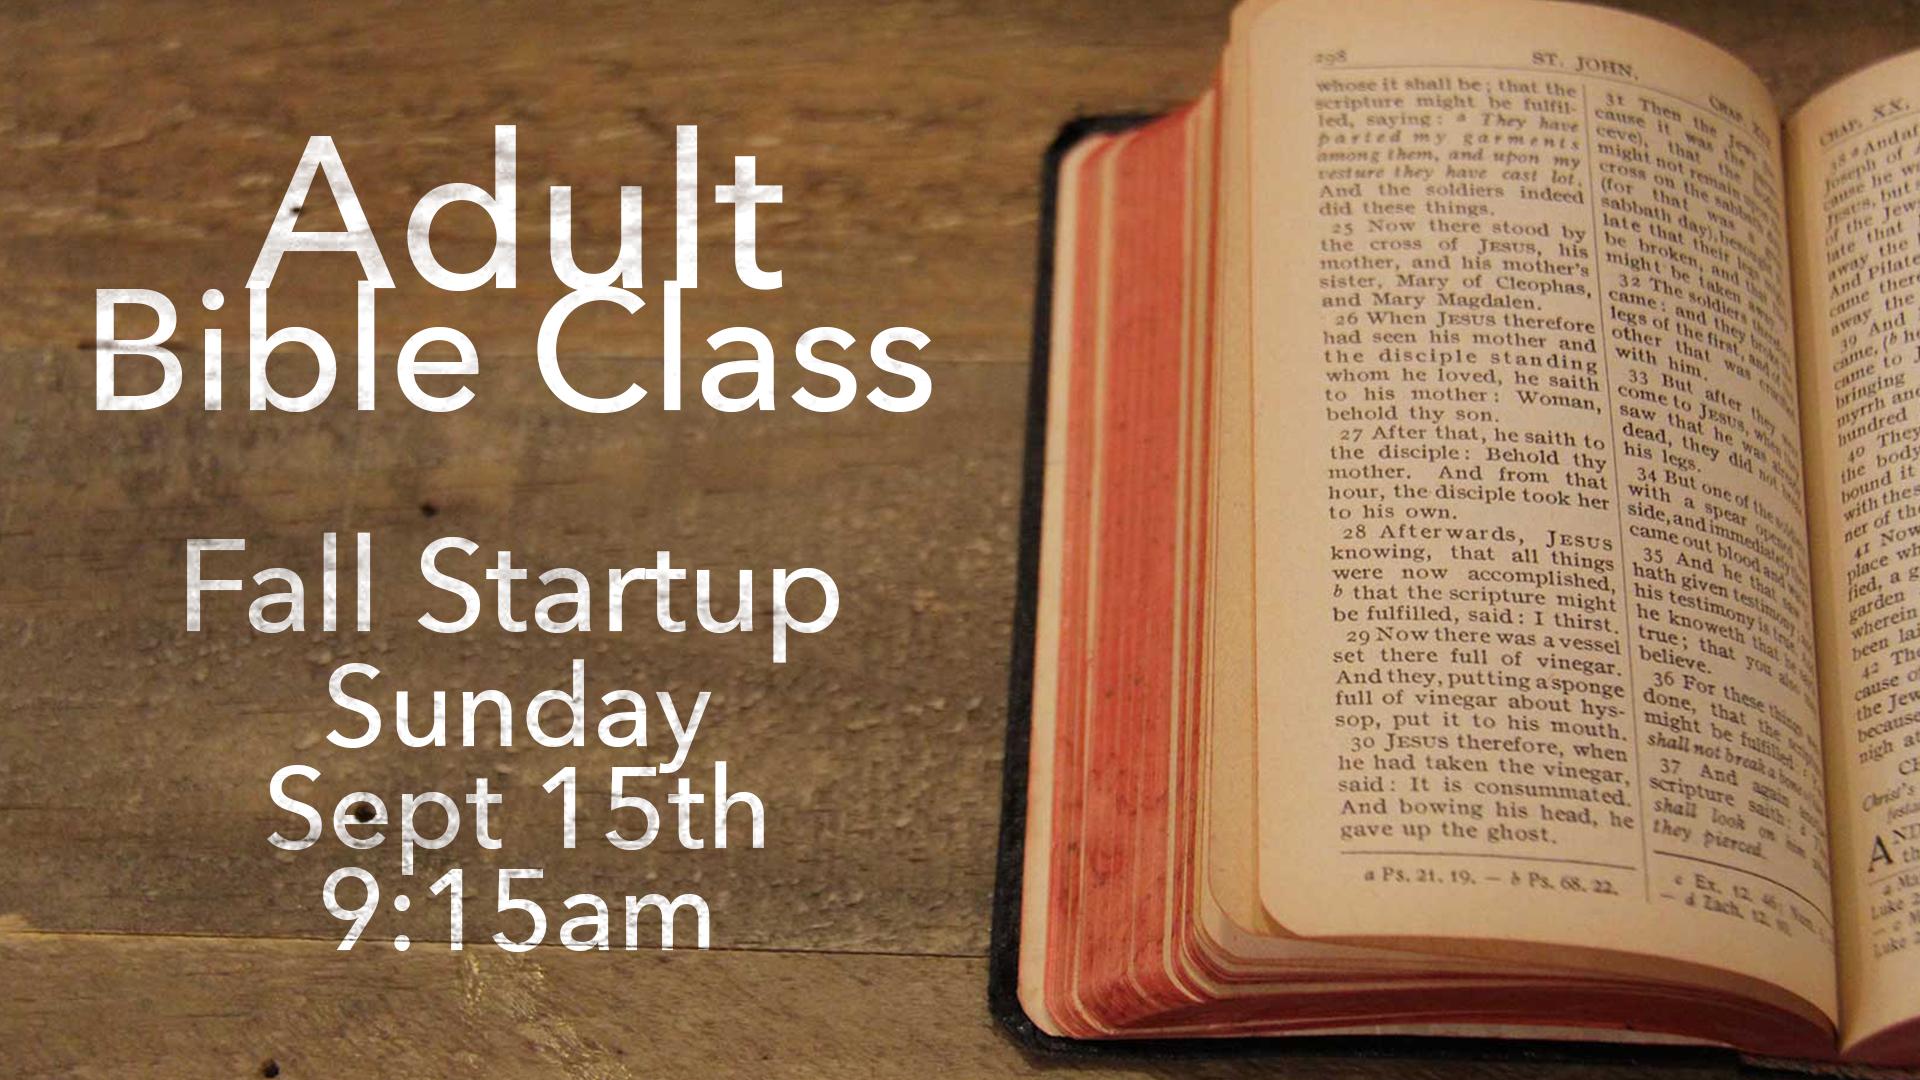 Adult Bible Study Class Fall Startup 2019.jpg